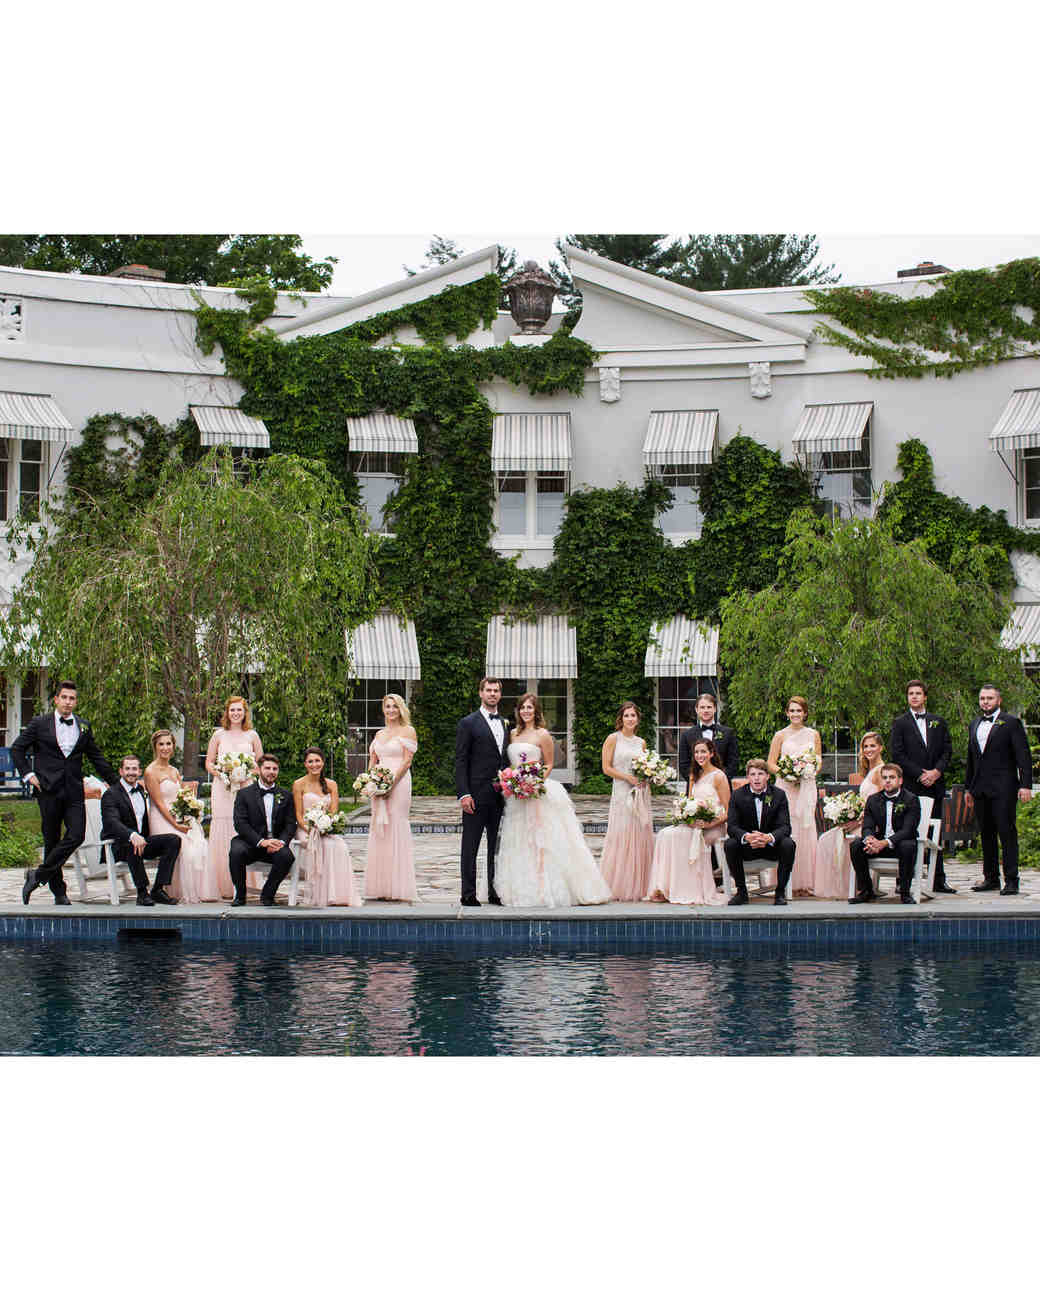 kaitlyn-robert-wedding-bridalparty-0103-s112718-0316.jpg